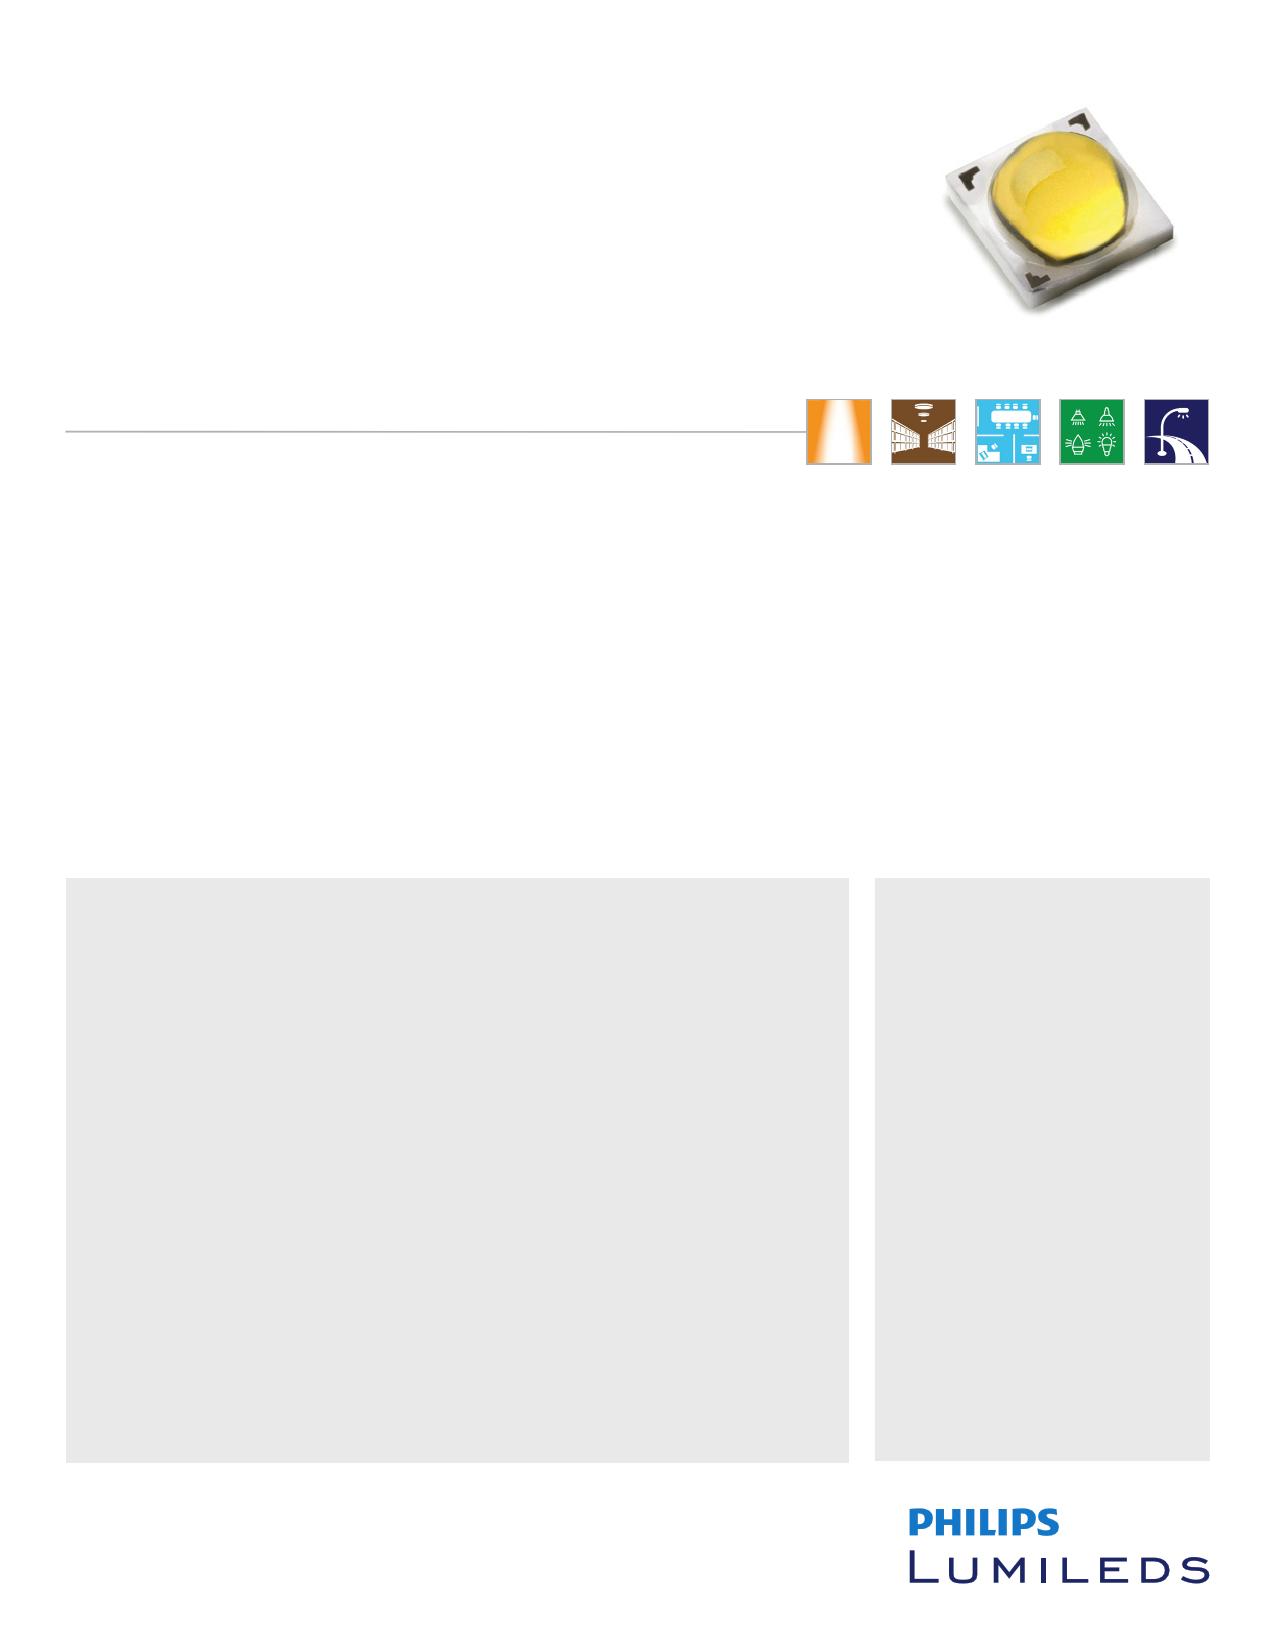 L1T2-3085000000000 datasheet